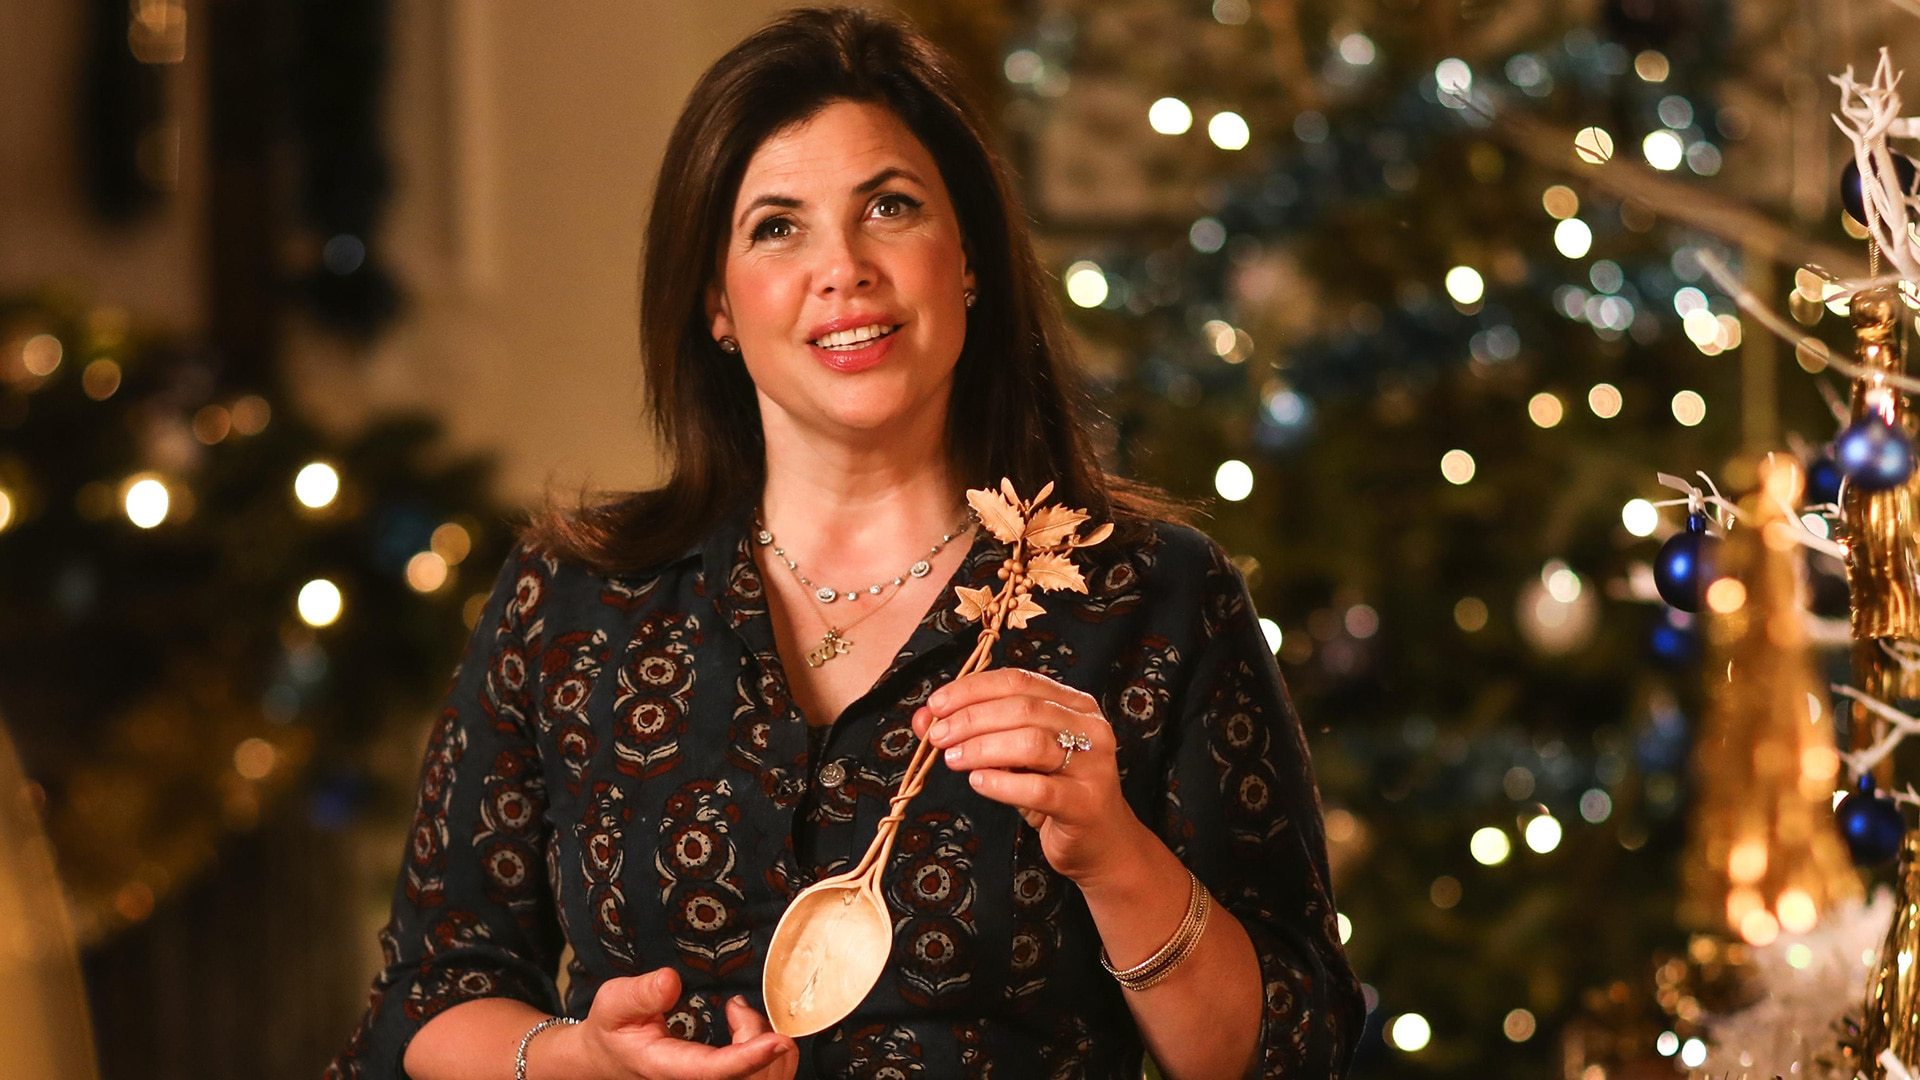 Kirstie s Handmade Christmas All 4